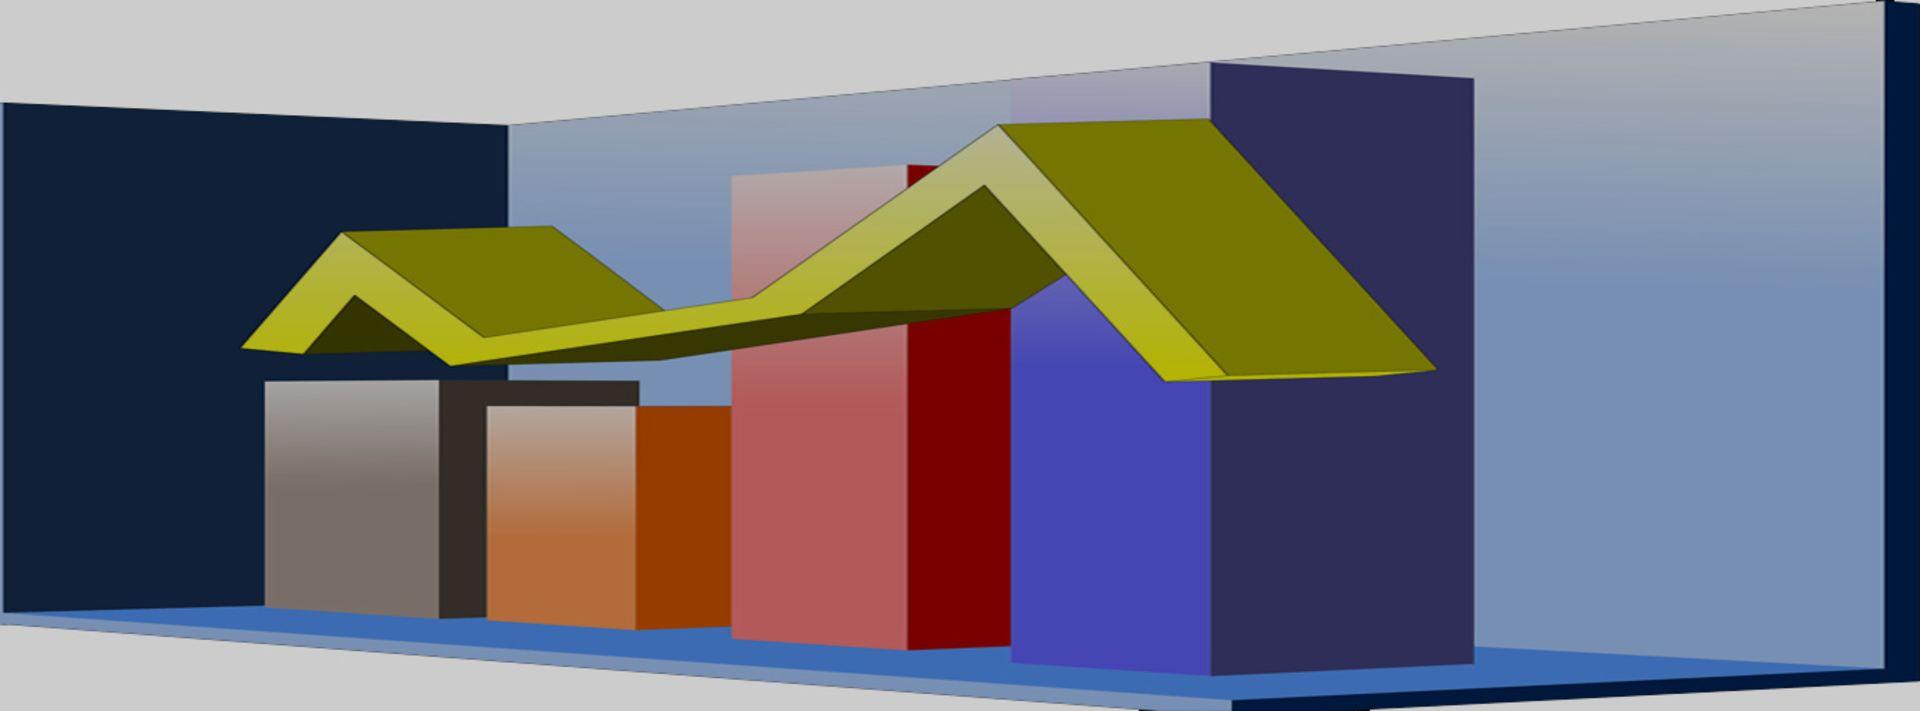 Predict the Housing Market With These Economic Indicators